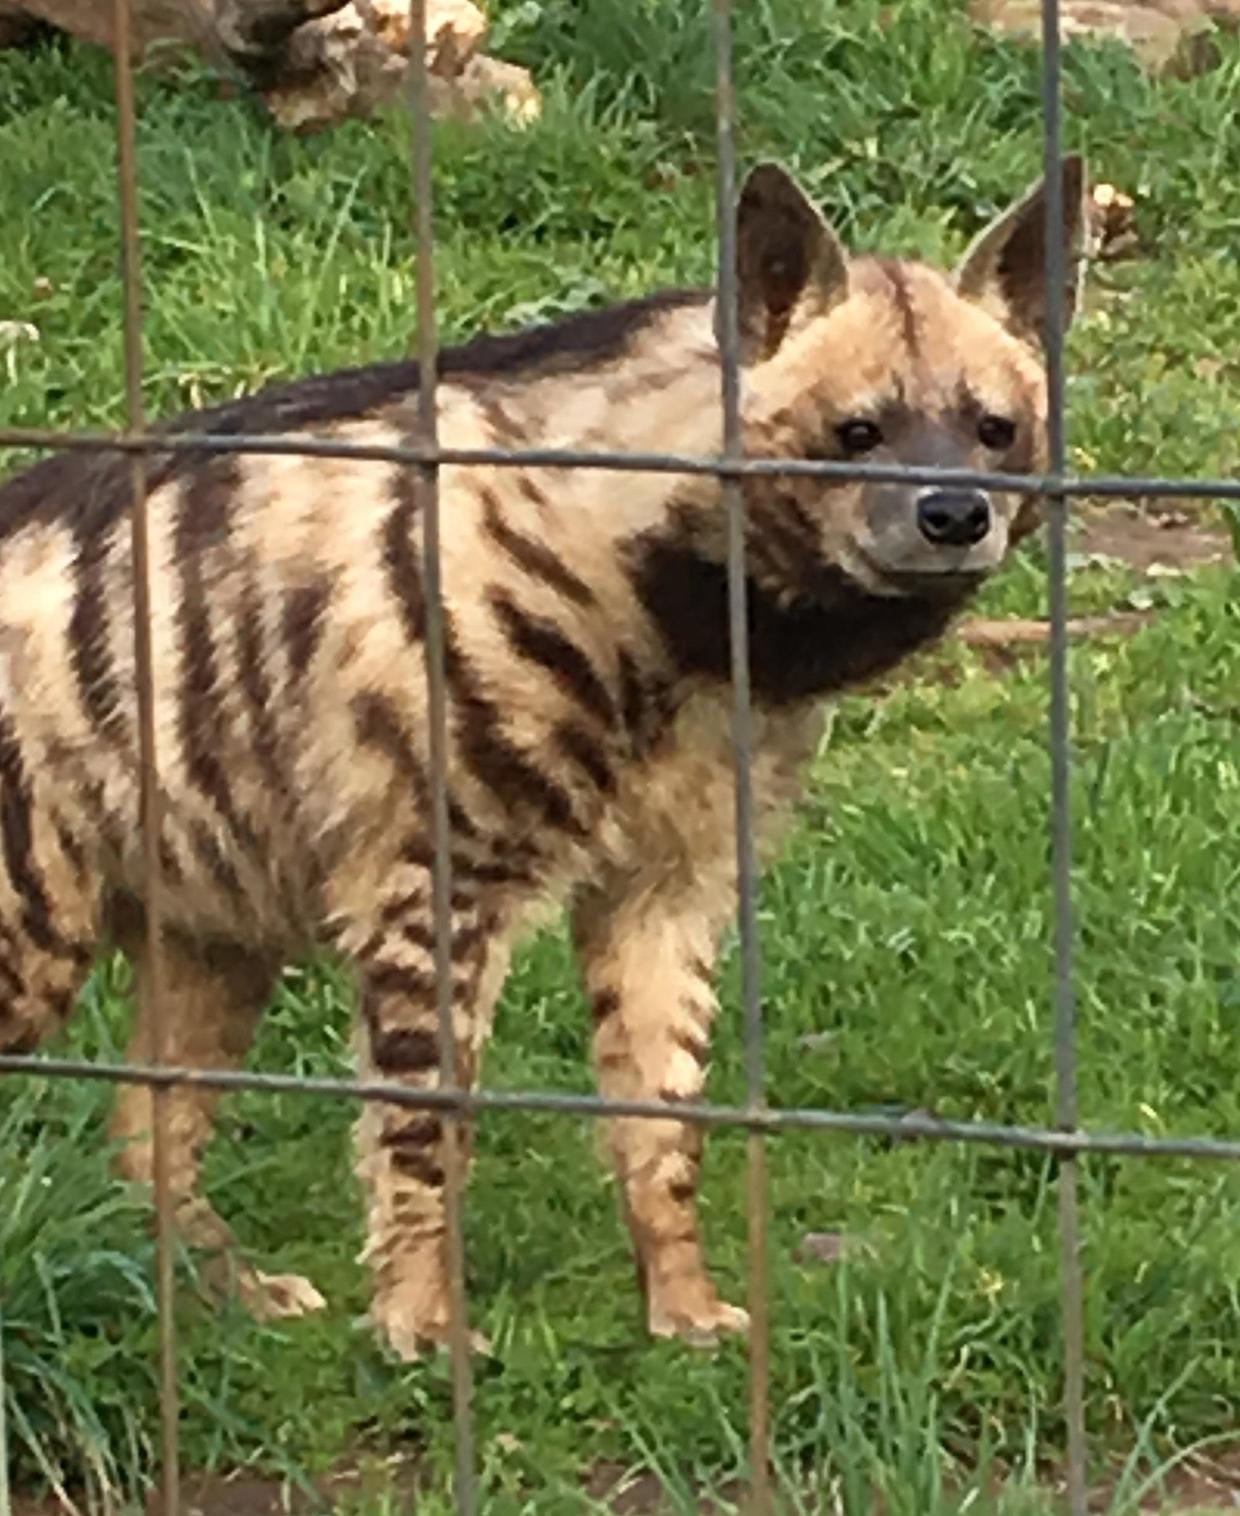 Striped Hyena at Safari West, Santa Rosa, CA